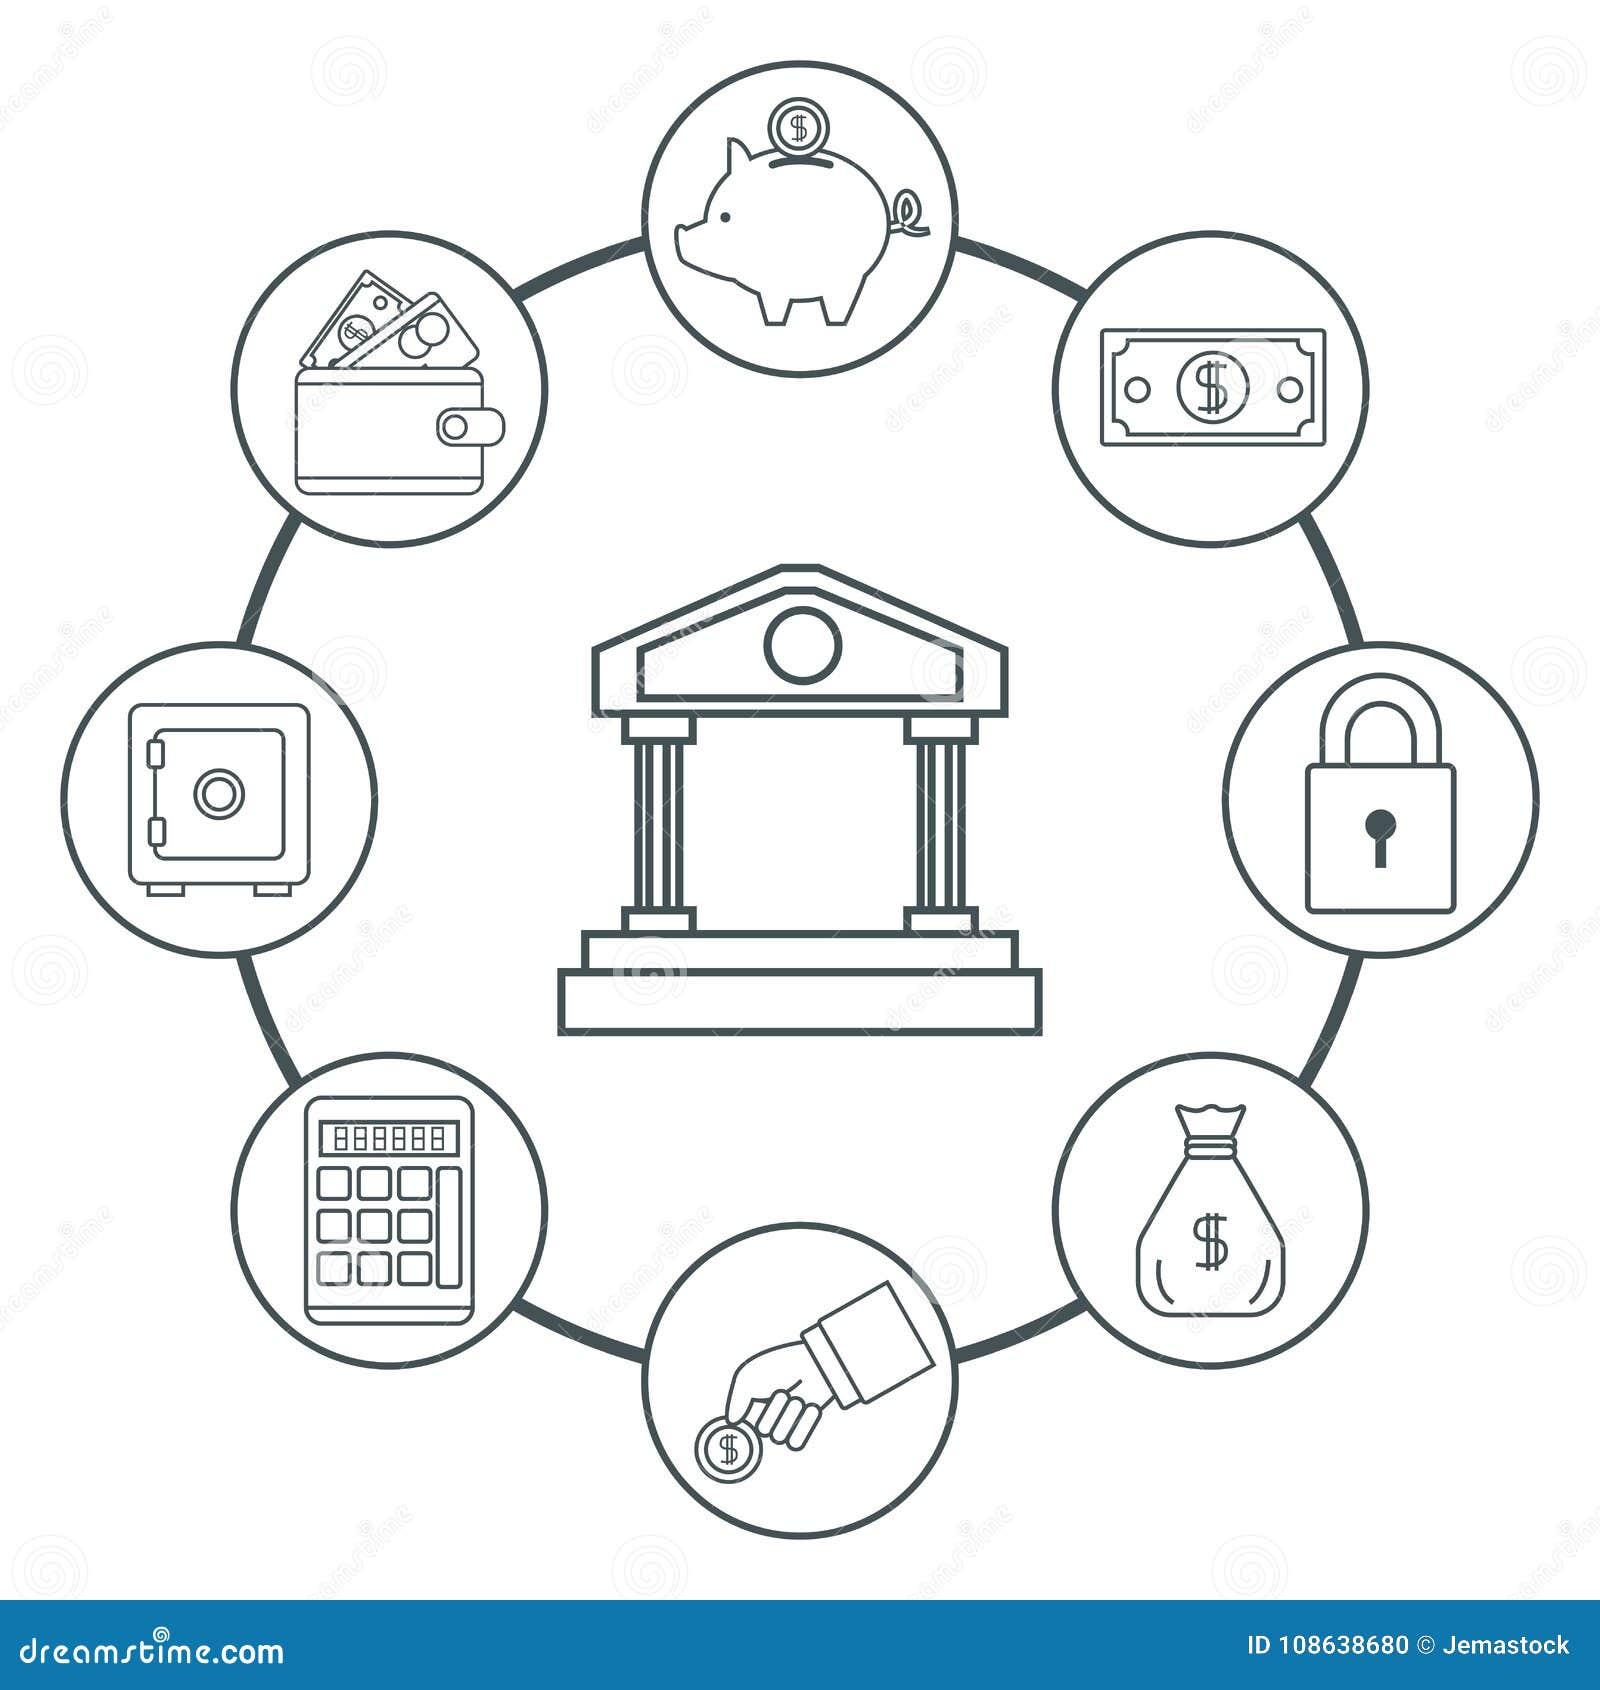 Money Certificate Of Deposit Stock Vector Illustration Of Budget